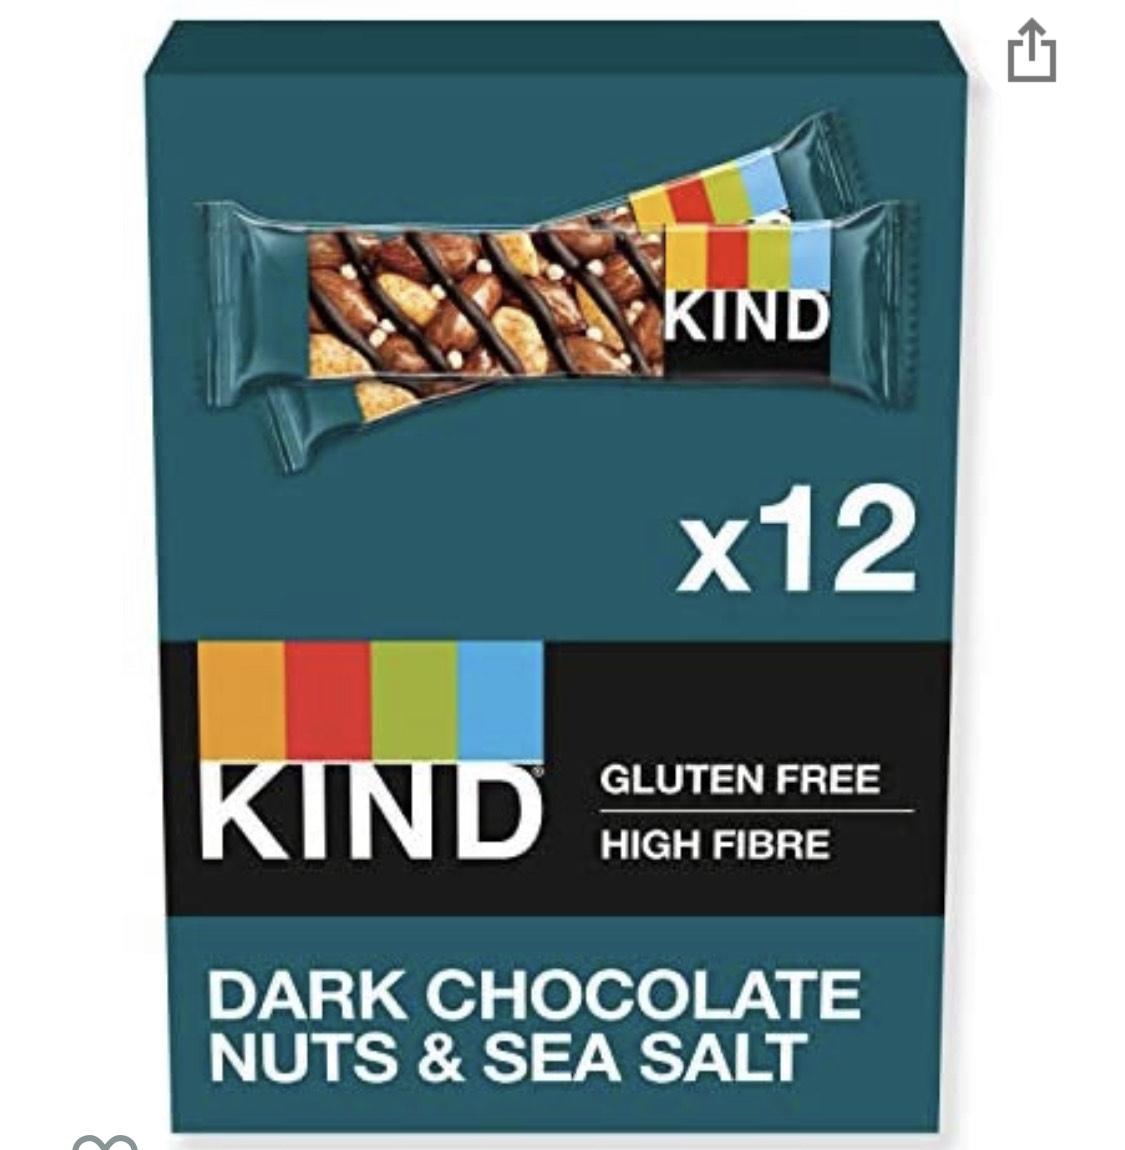 KIND Bars, Healthy Gluten Free & Low Calorie Snack Bars, Dark Chocolate Nuts & Sea Salt, 12 Bars £7.19 Prime (+£4.49 Non Prime) @ Amazon